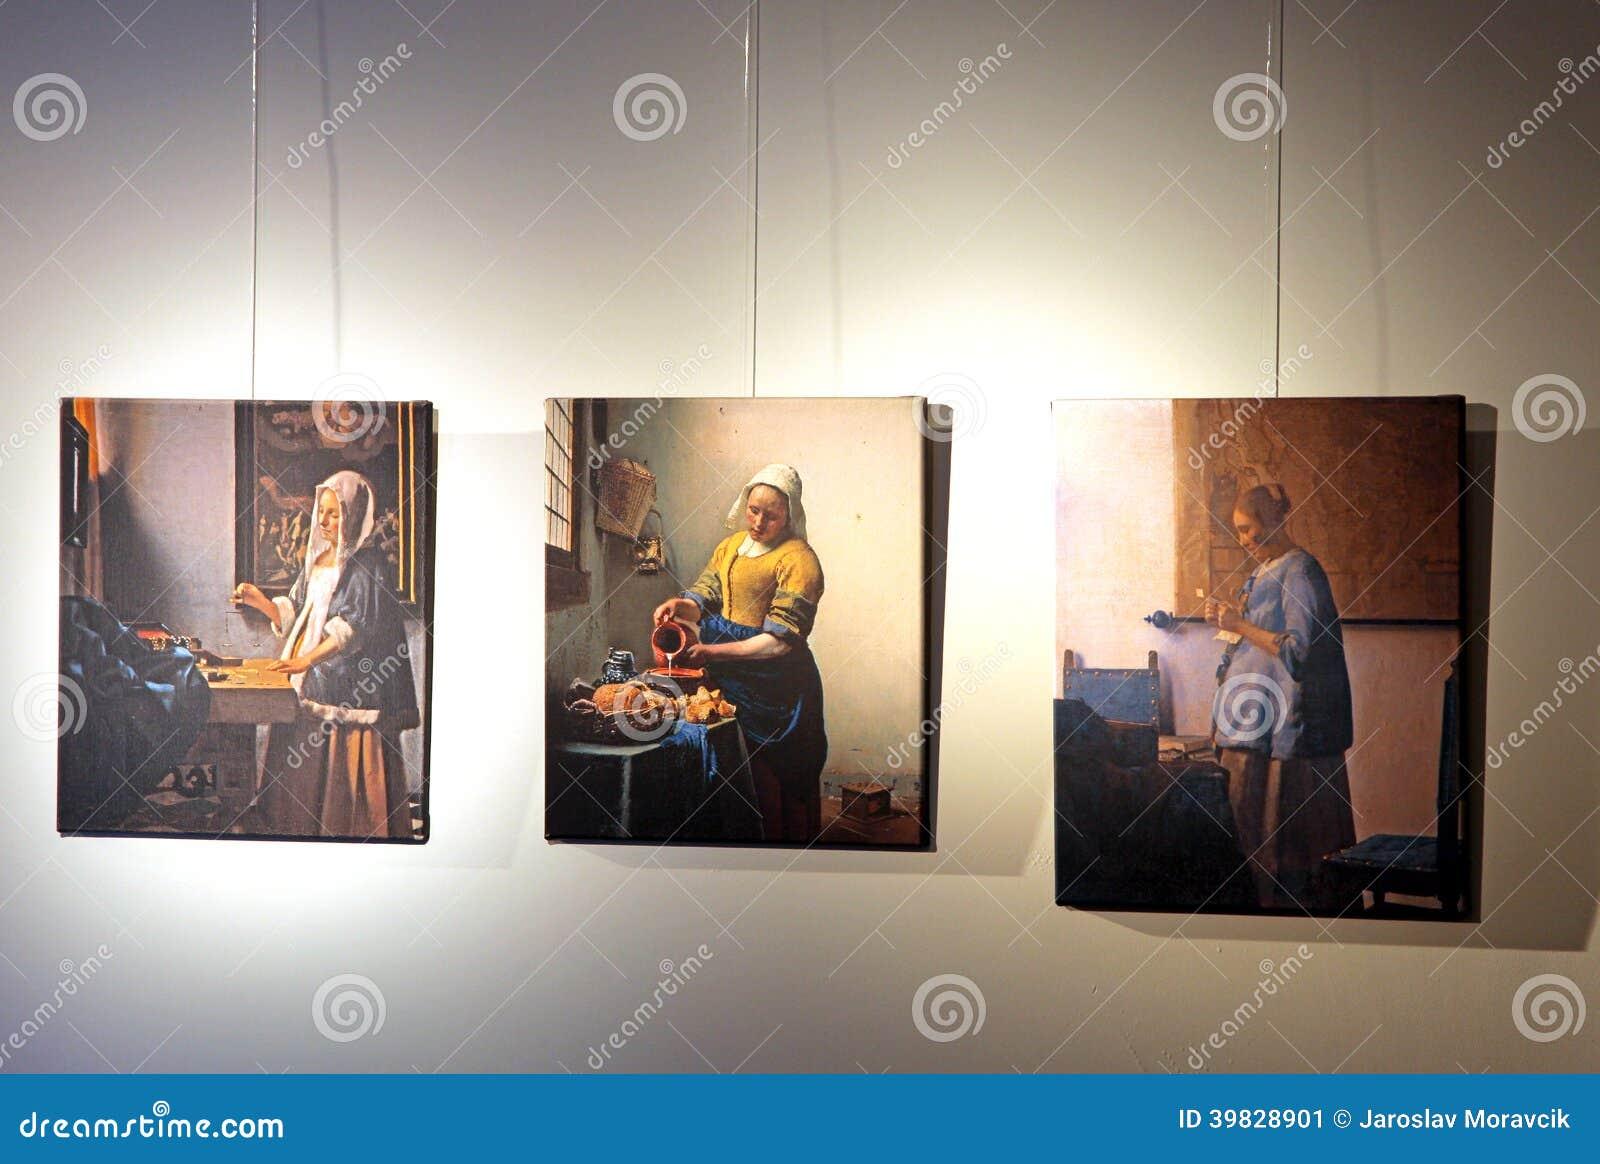 Centro de Vermeer, louça de Delft - Países Baixos